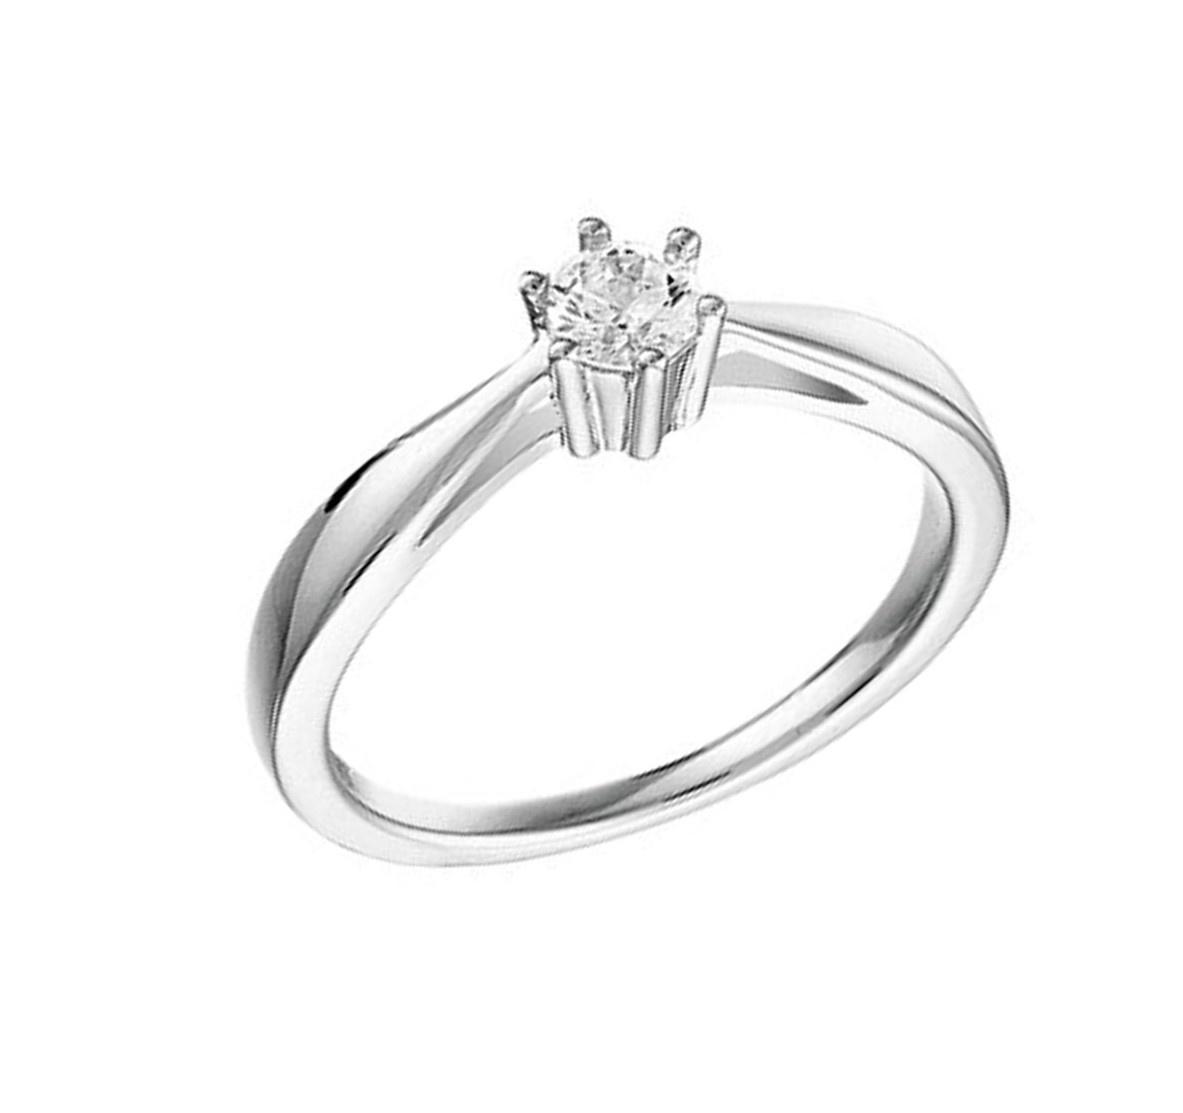 New Bling Zilveren Ring Zirkonia - 925 Sterling Zilver